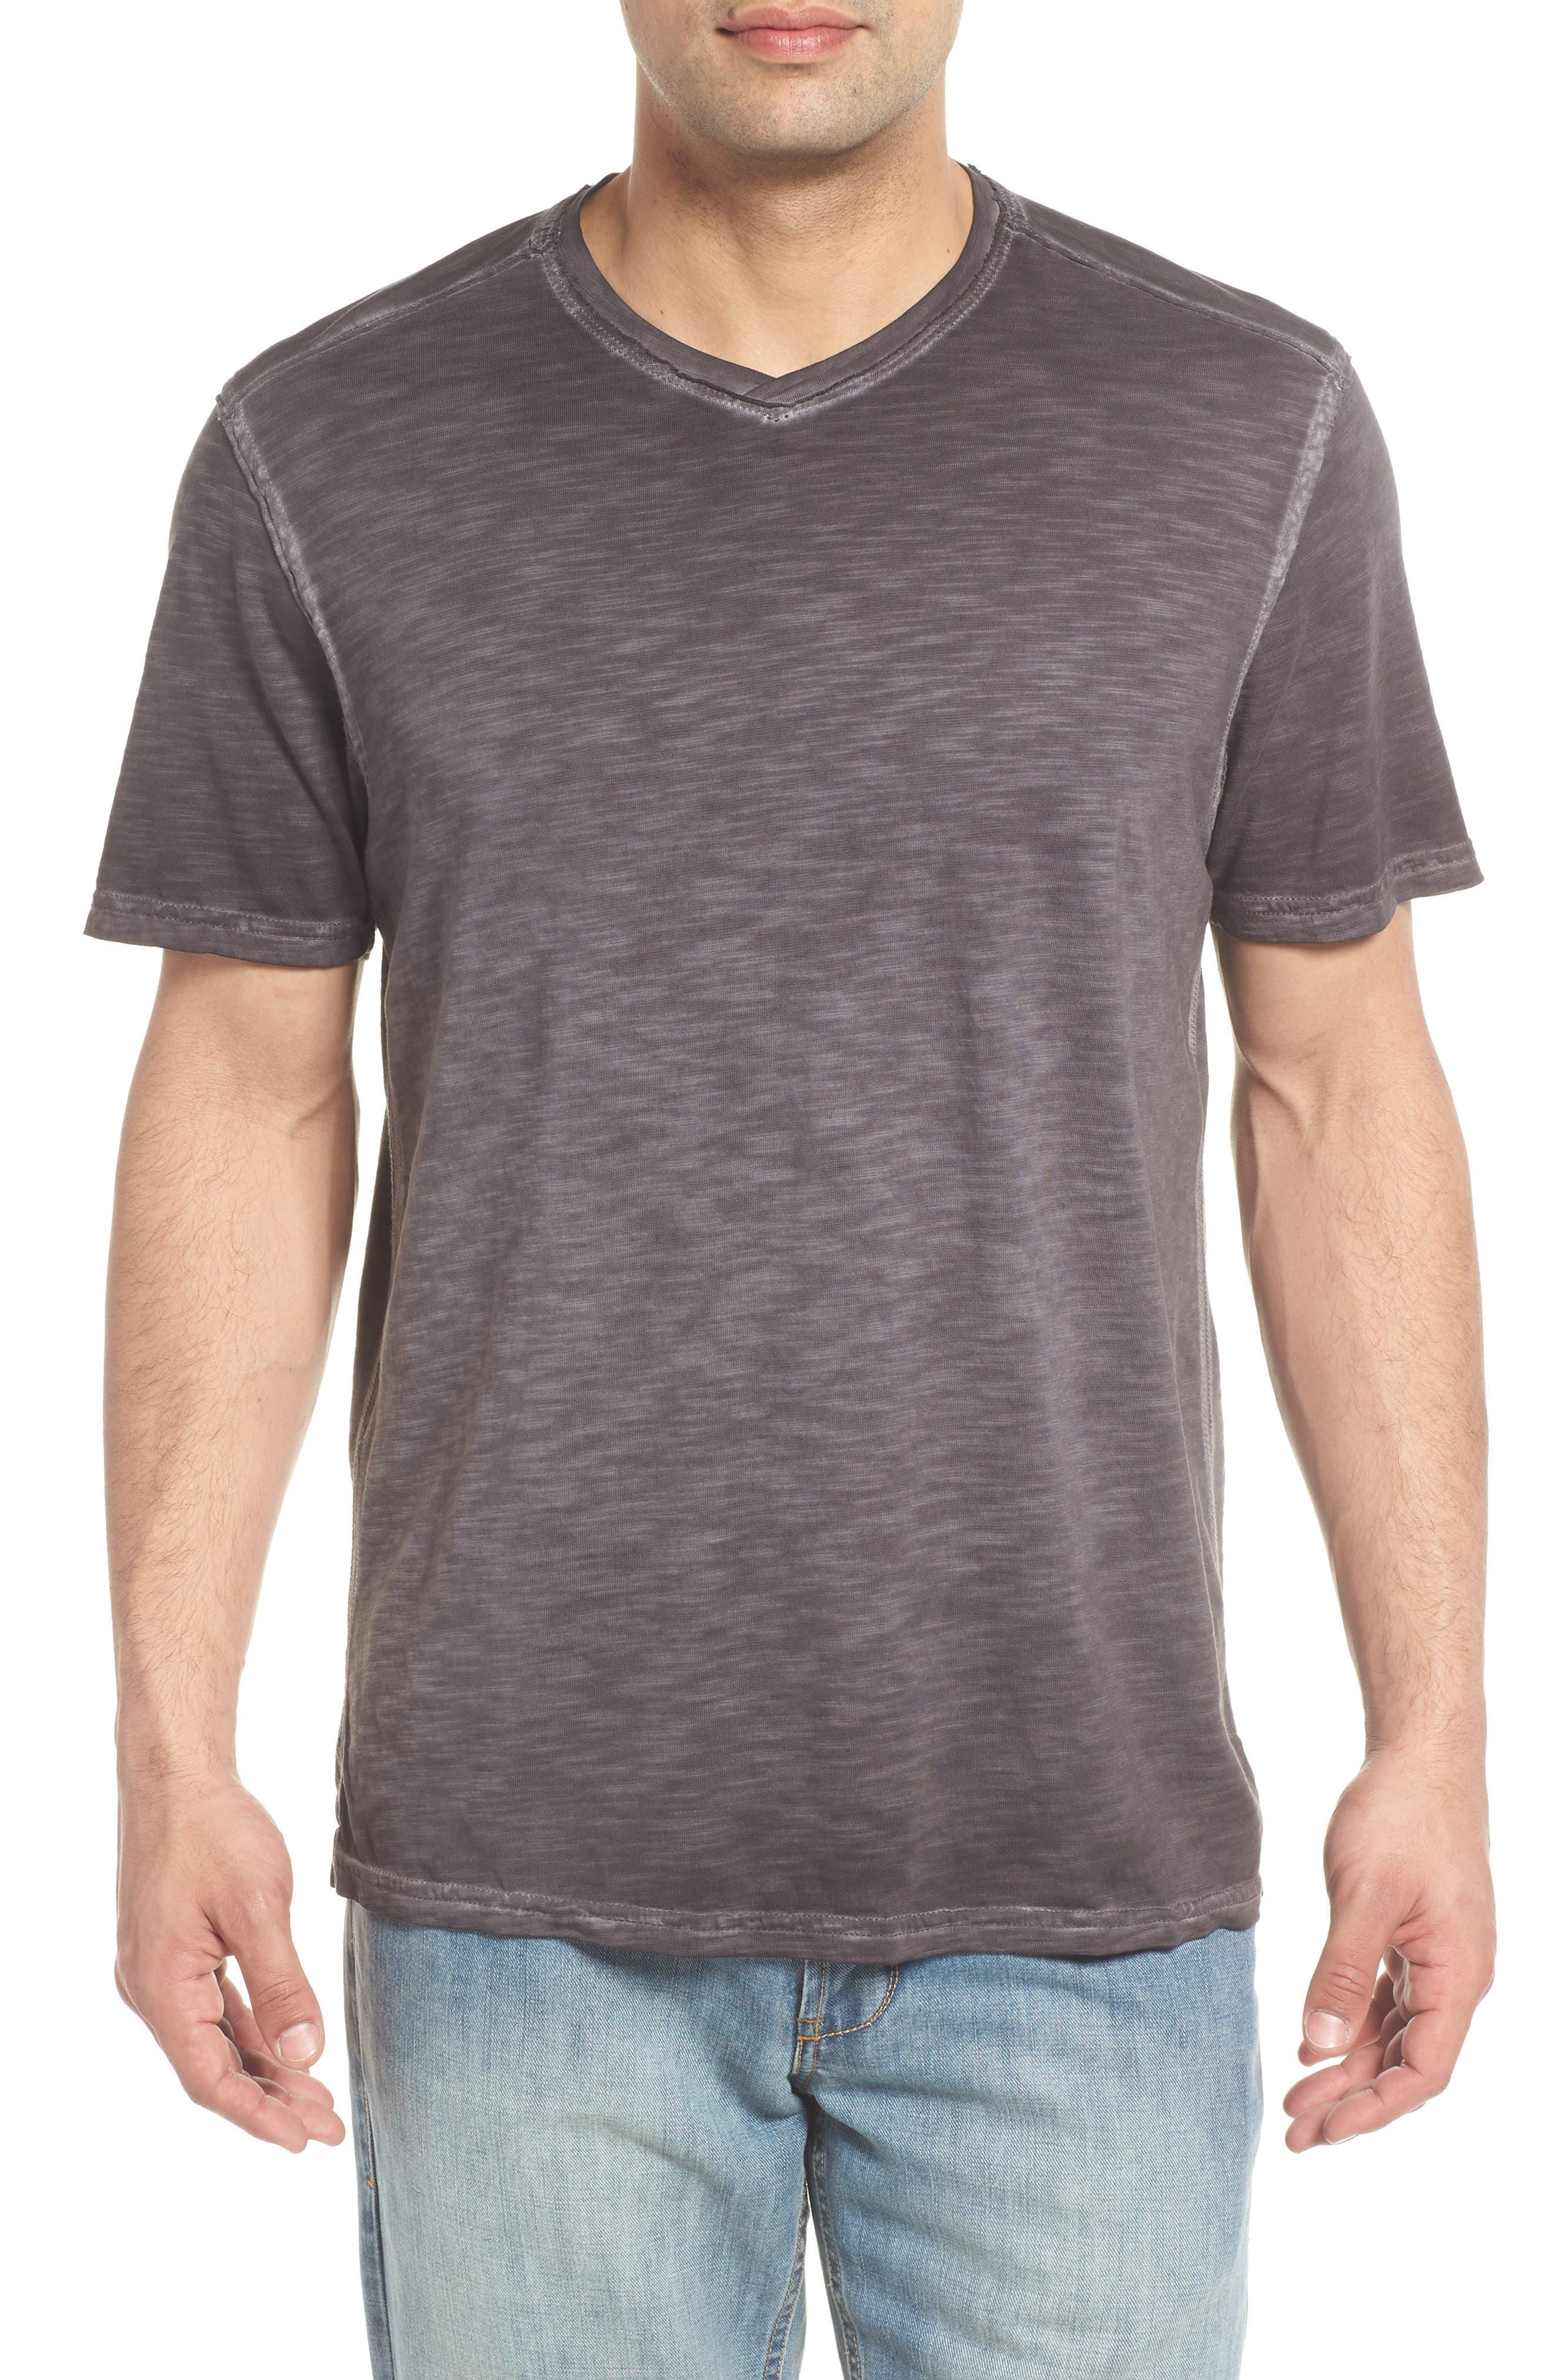 Suncoast Shores V-Neck T-Shirt,                         Main,                         color, COAL